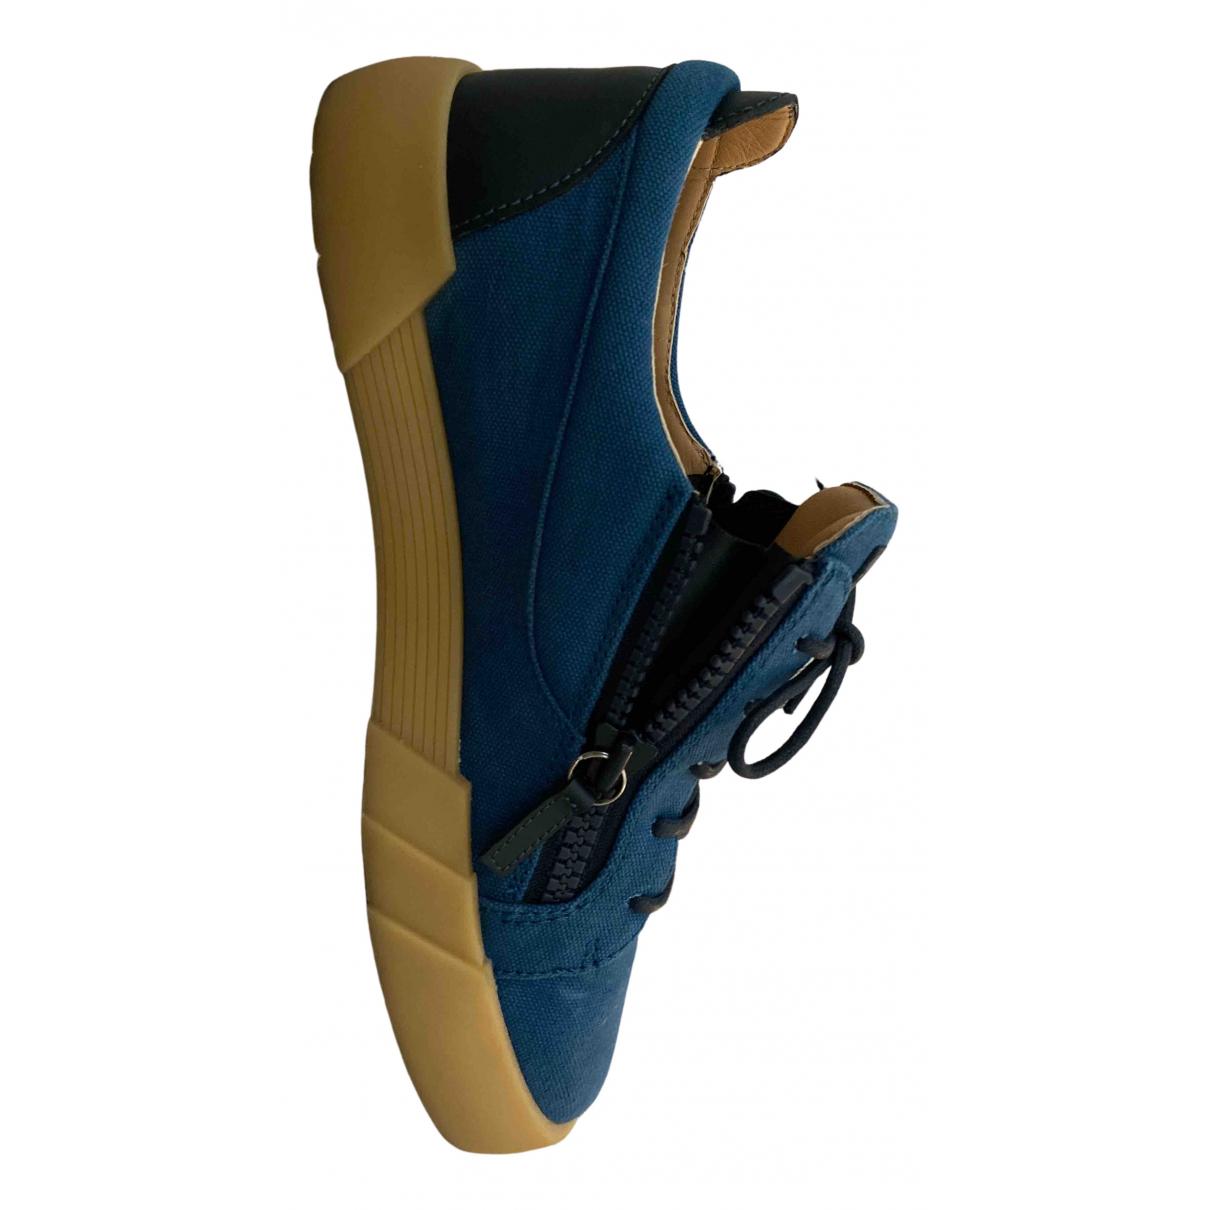 Giuseppe Zanotti - Baskets   pour homme en cuir - bleu